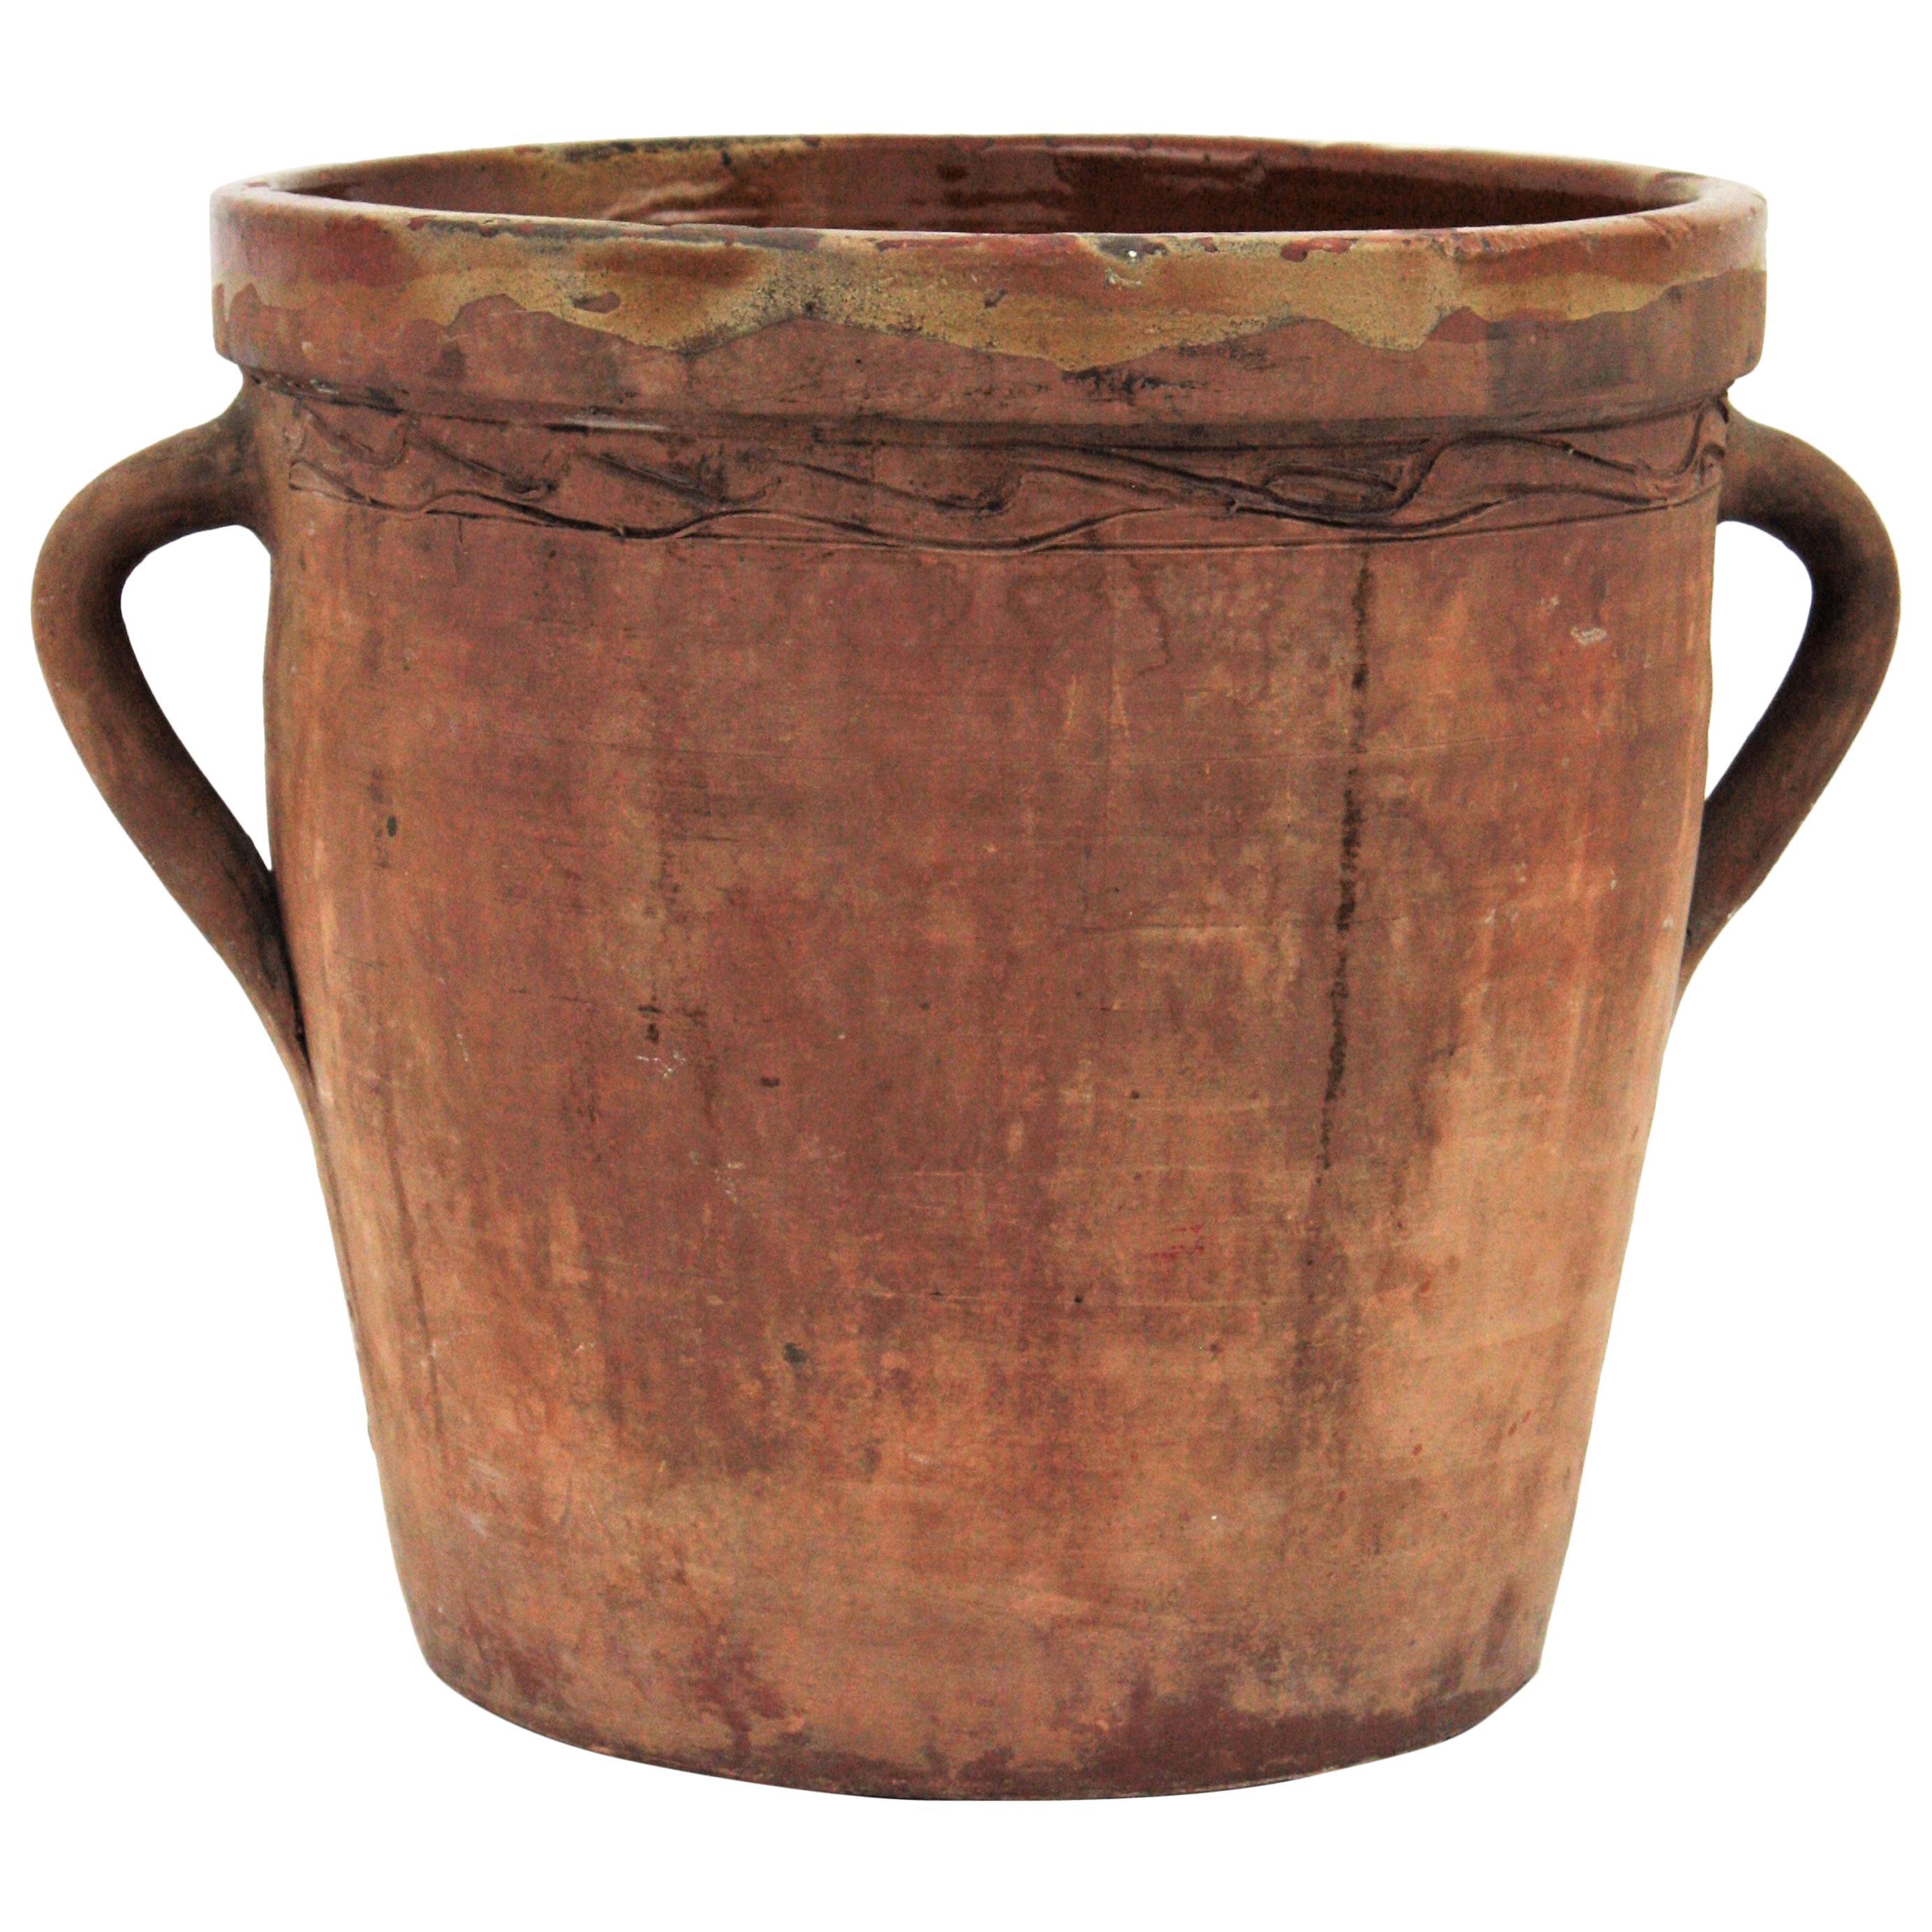 Spanish Terracotta Cheese Jar with Handles, 19th Century